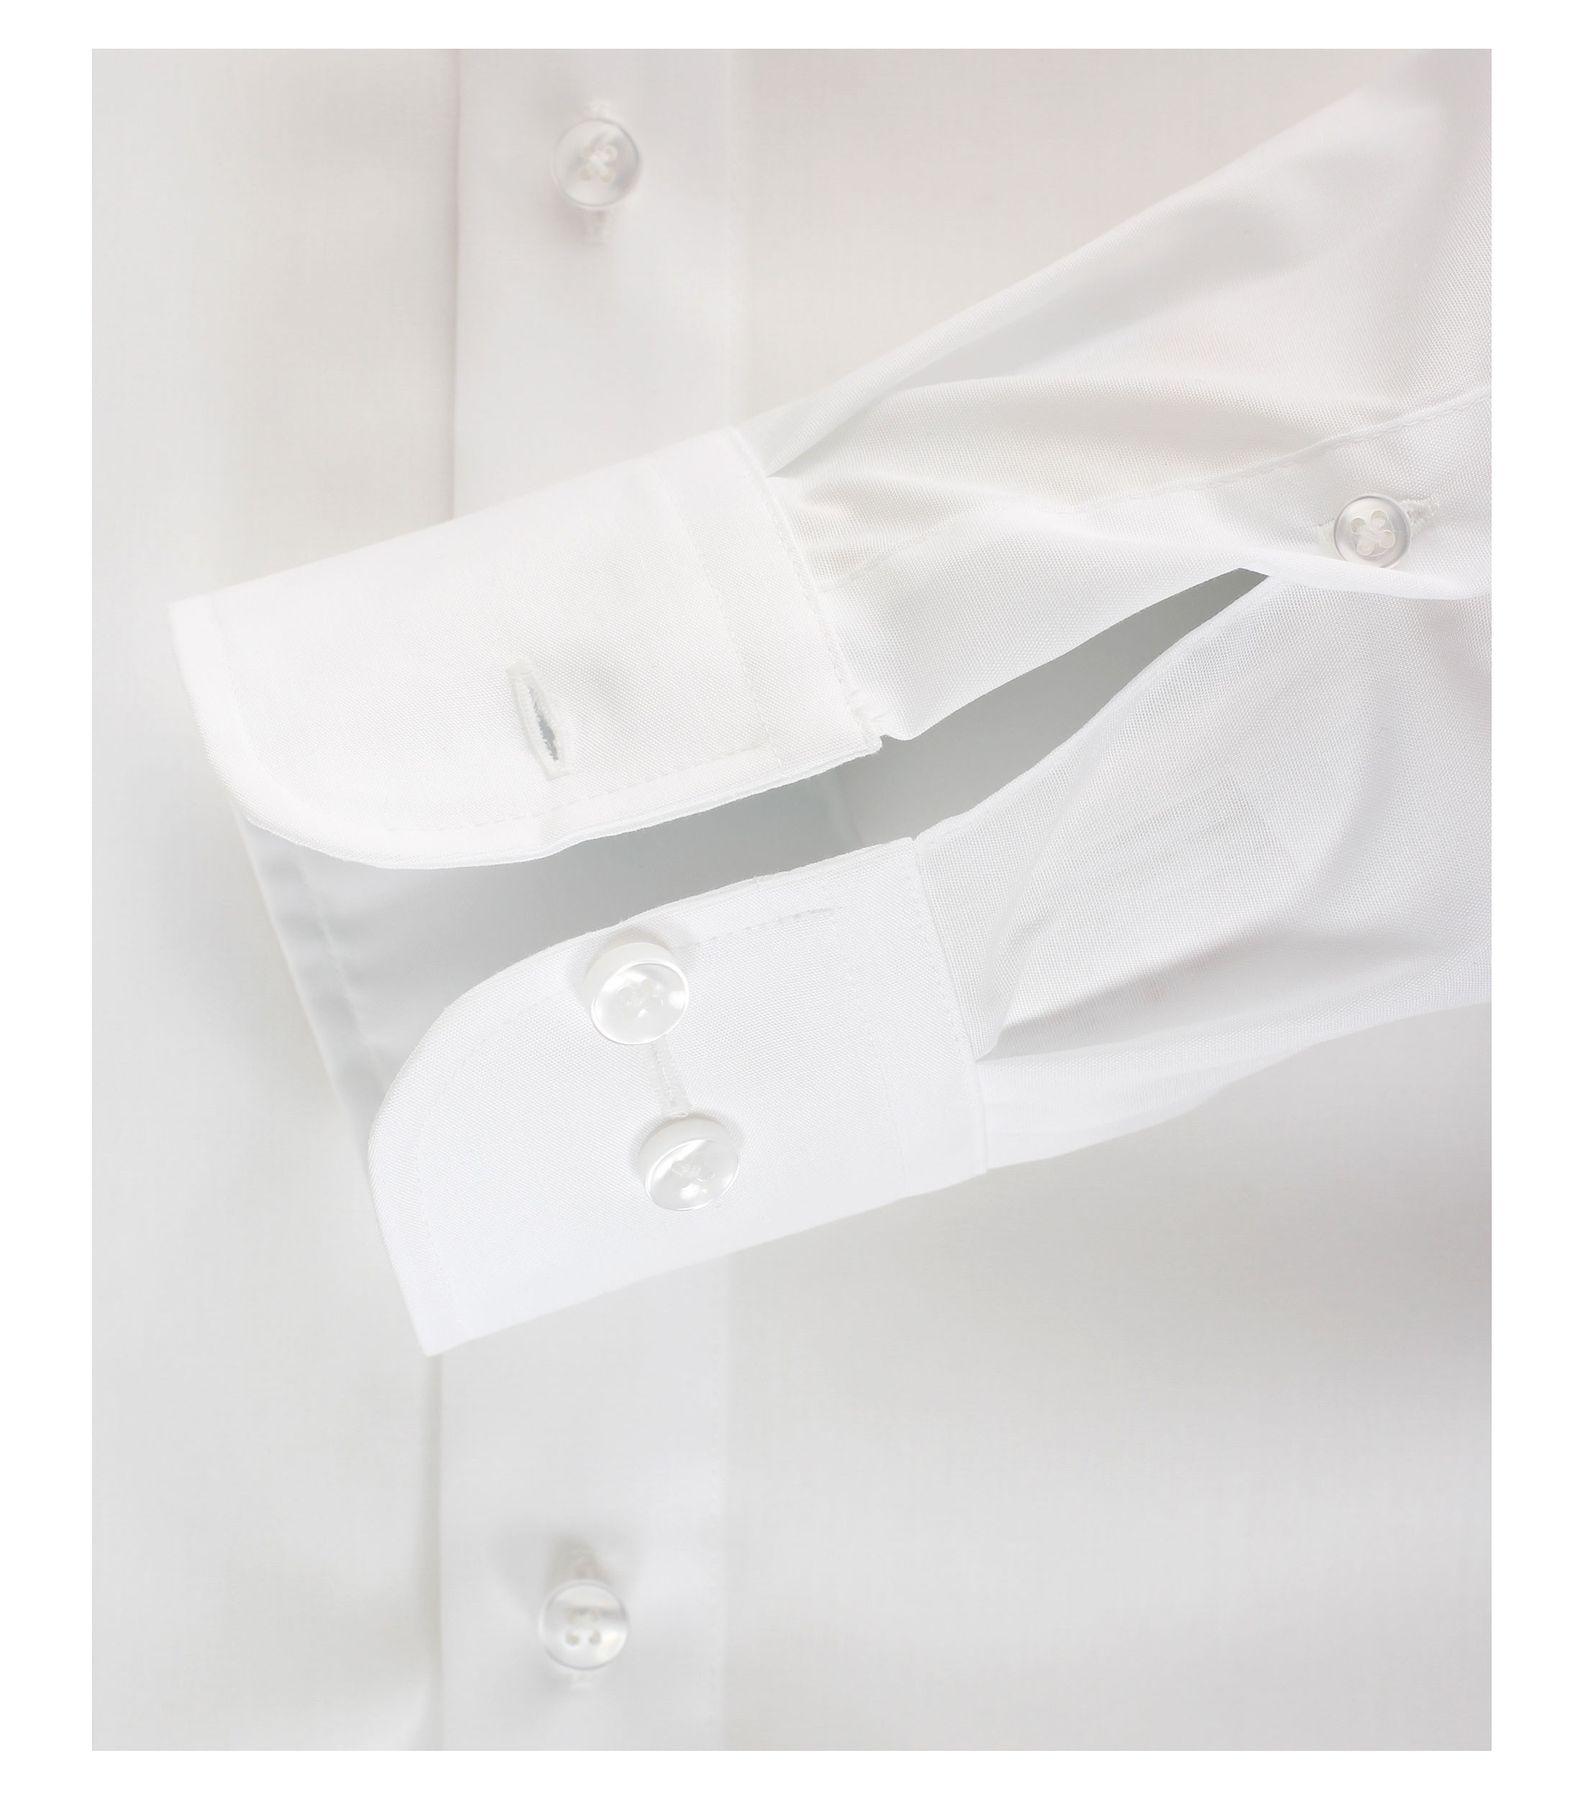 Casamoda - Modern Fit - Bügelfreies Herren Business Langarm Hemd verschiedene Farben (006560A) – Bild 8